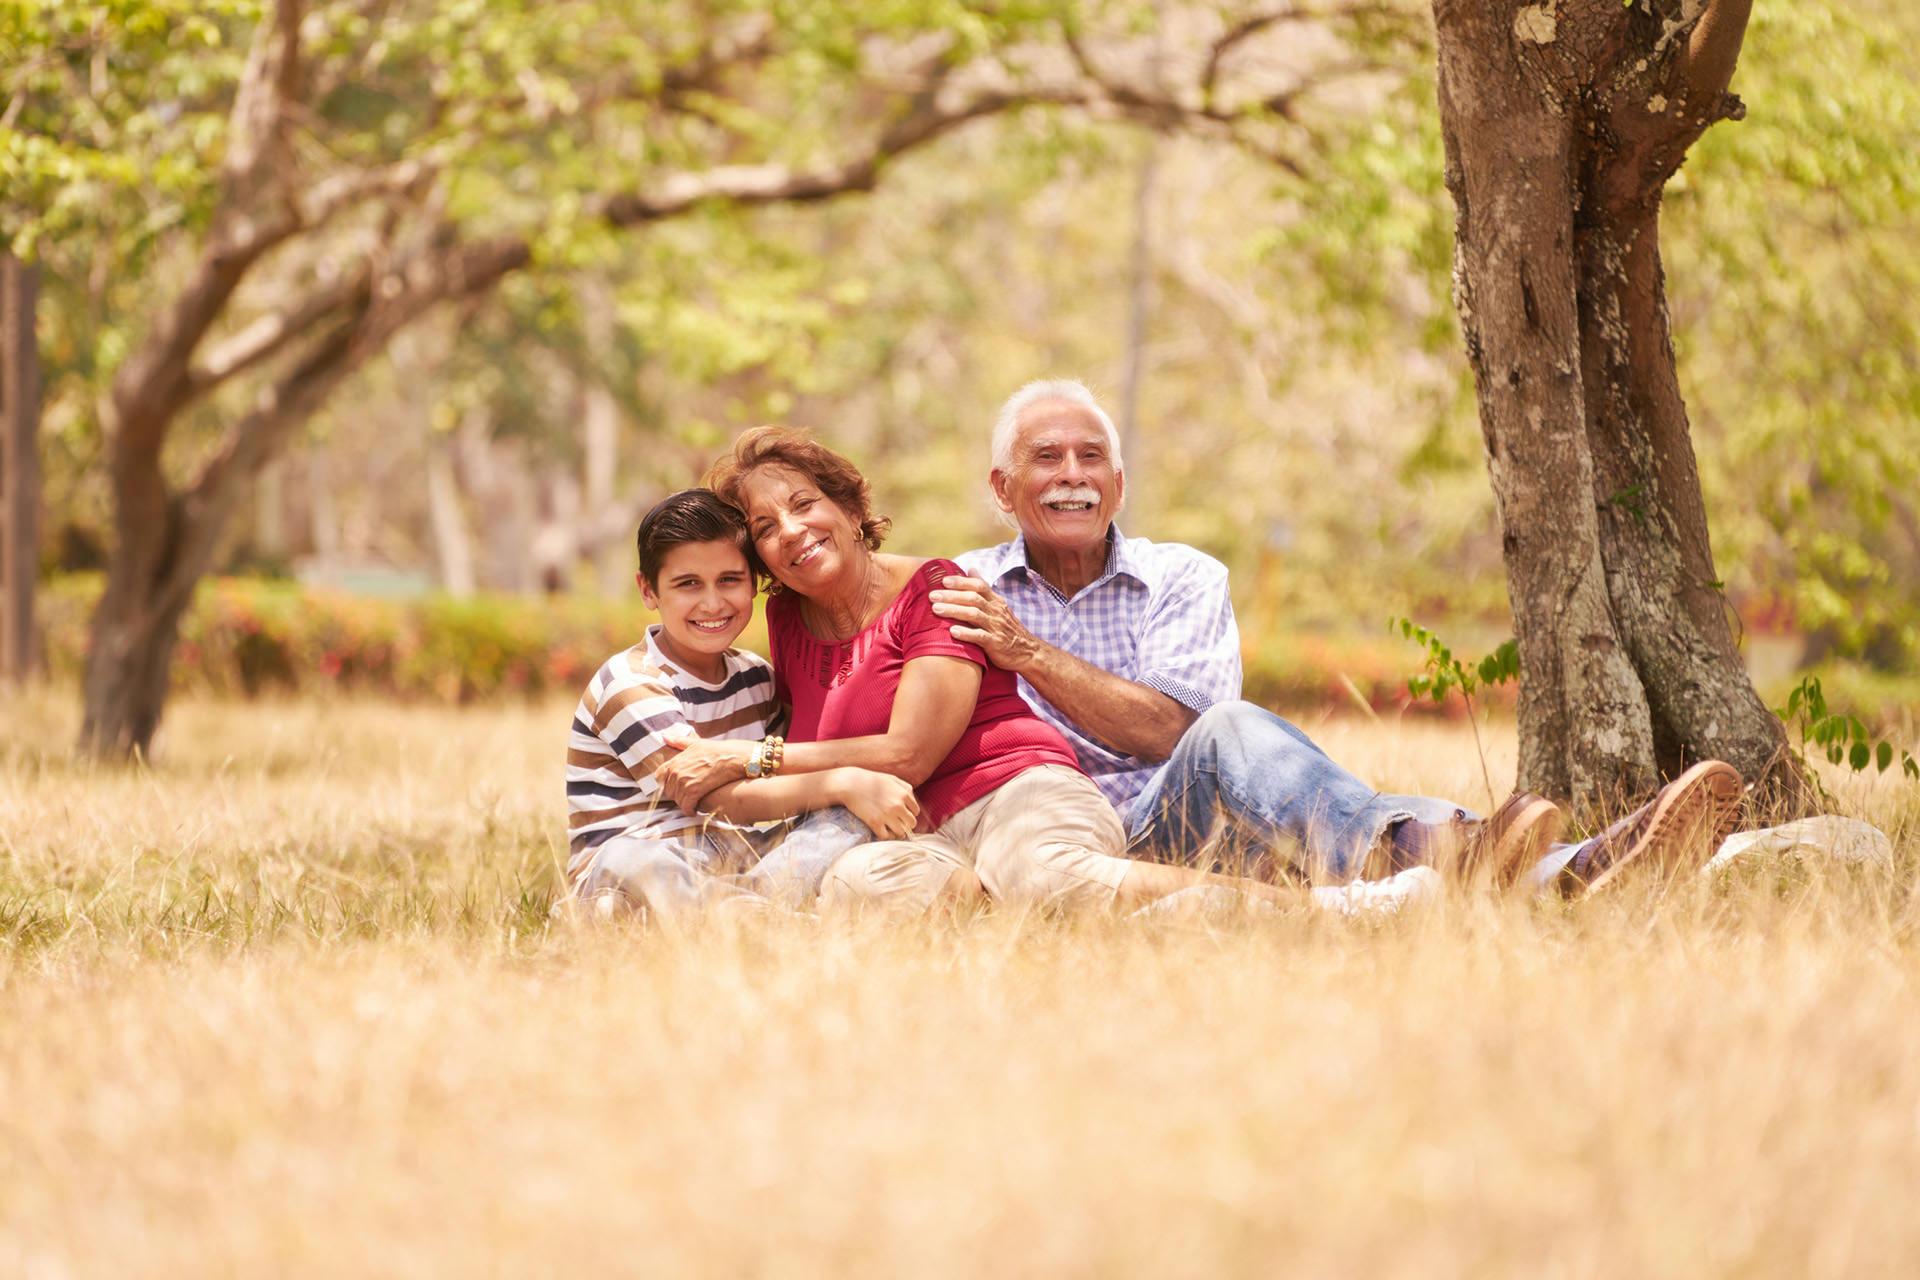 Senior Couple Hugging Boy On Grass